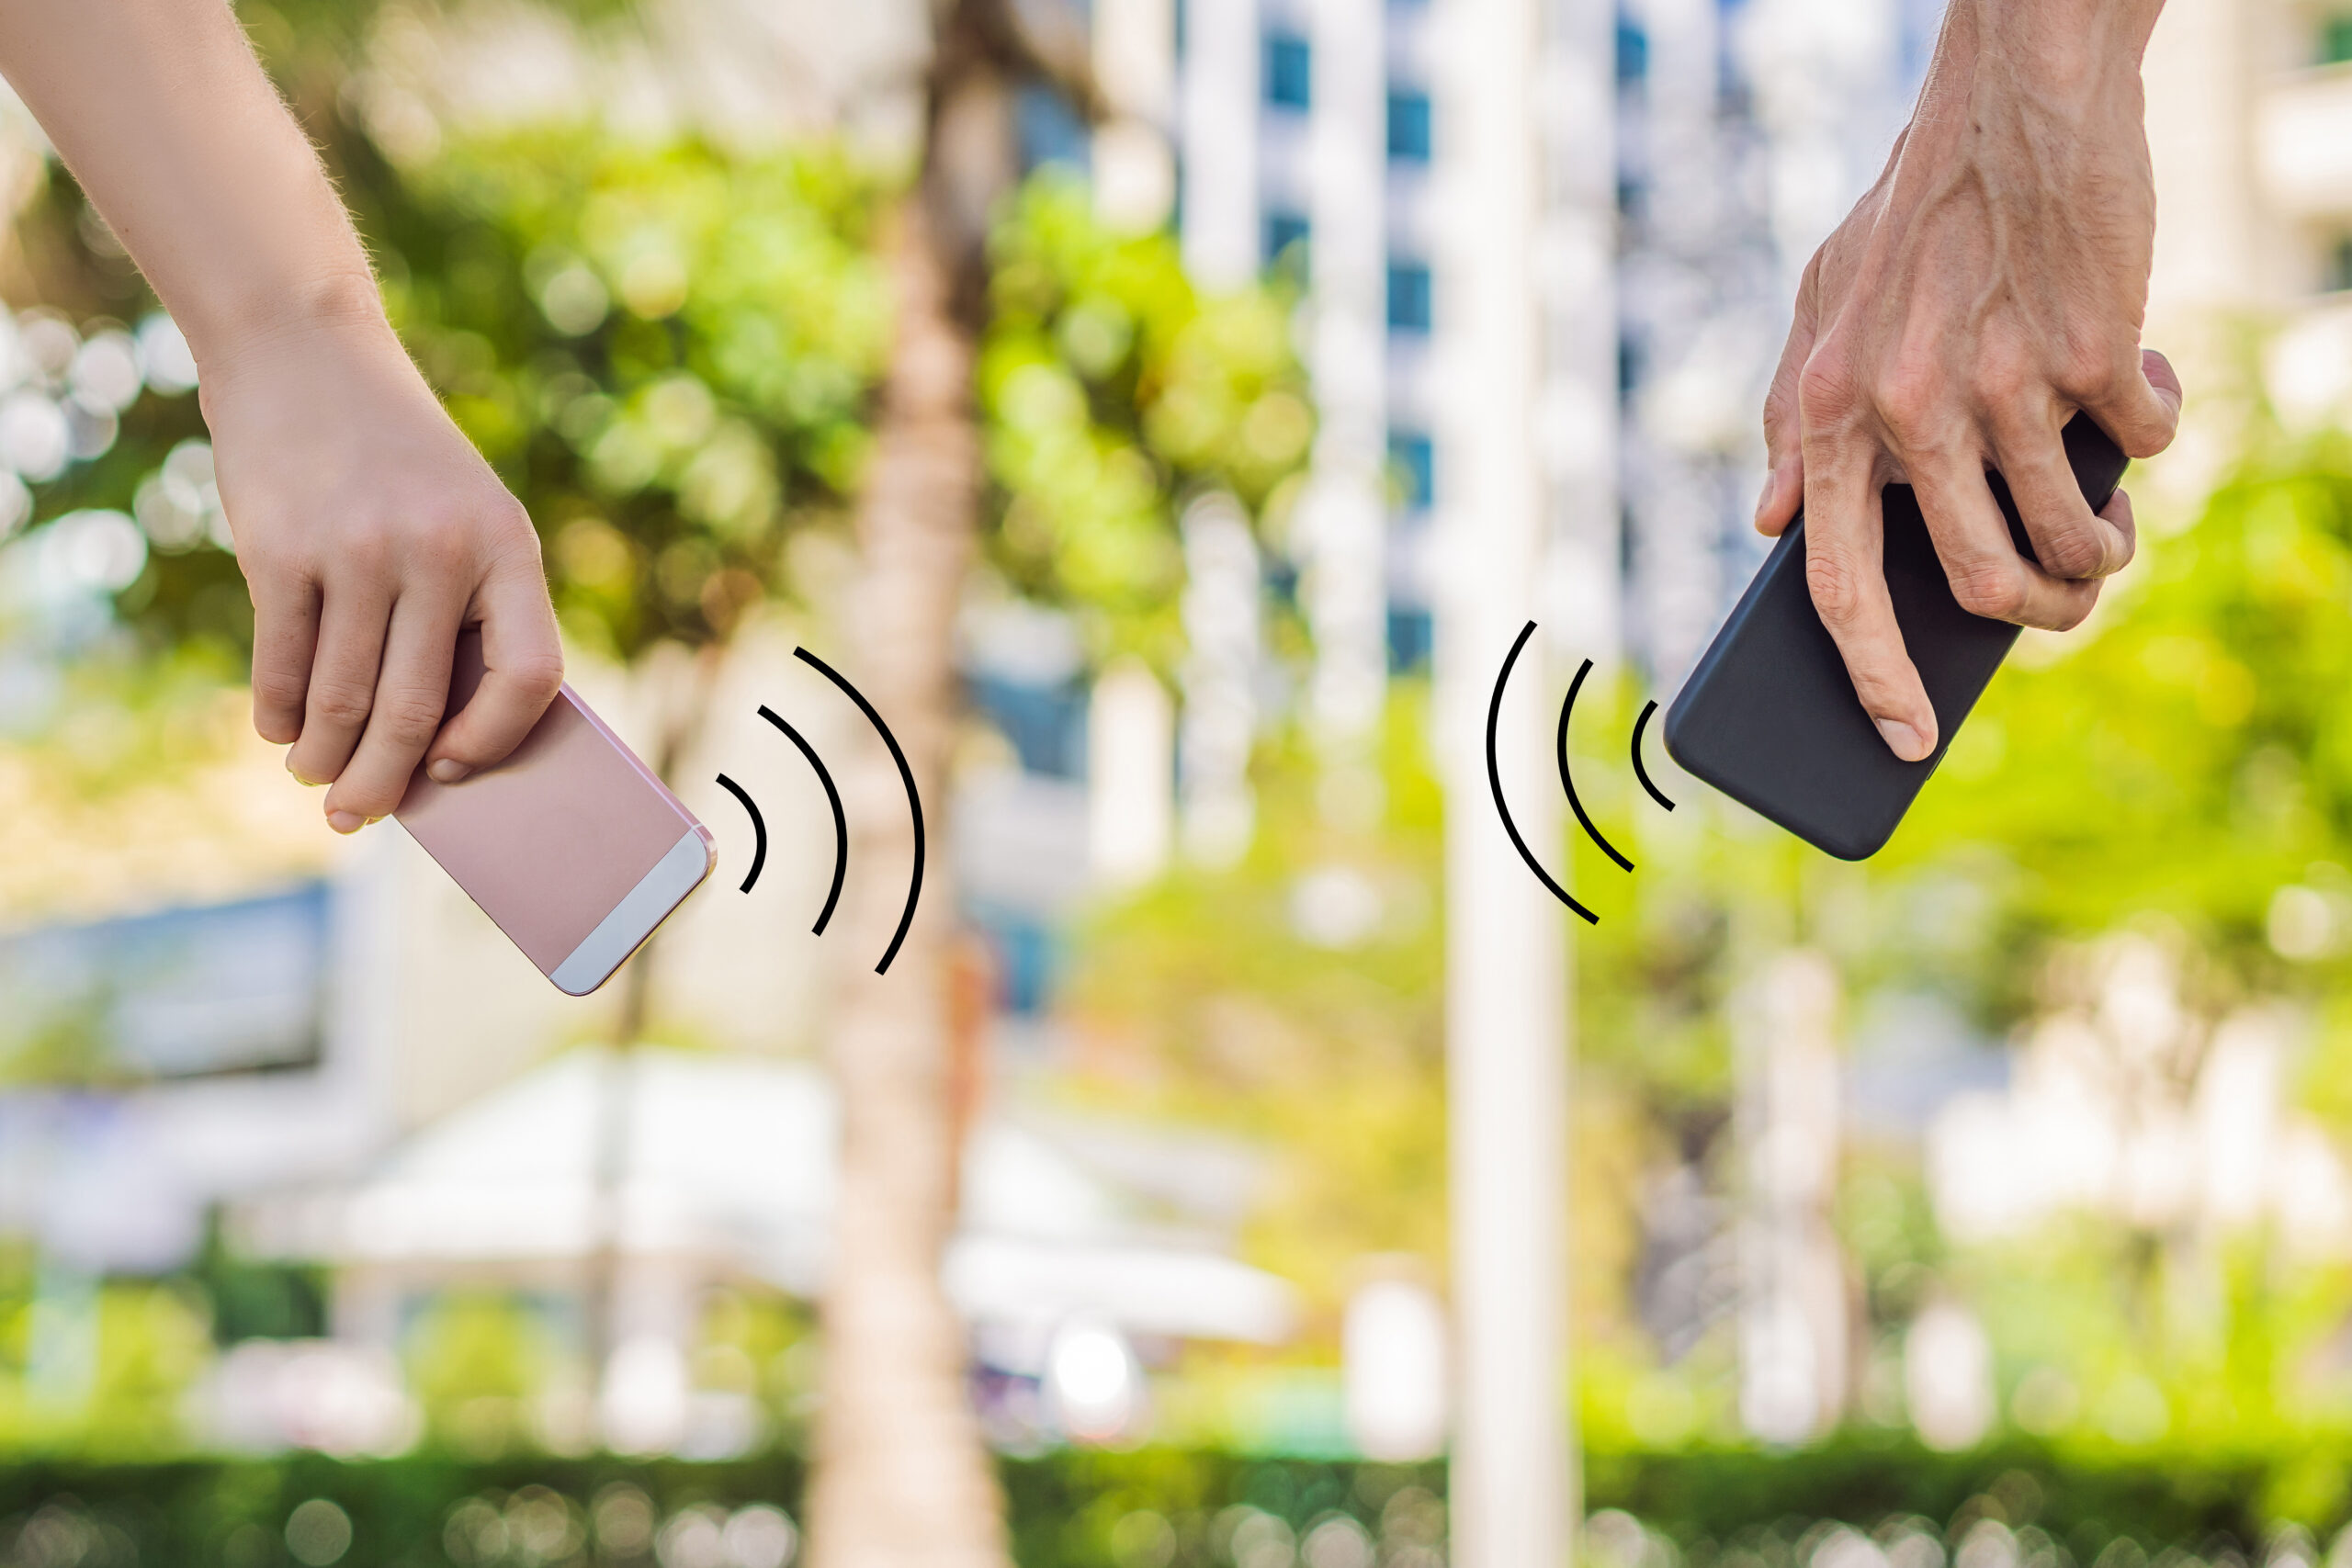 Bluetooth via contact tracing.